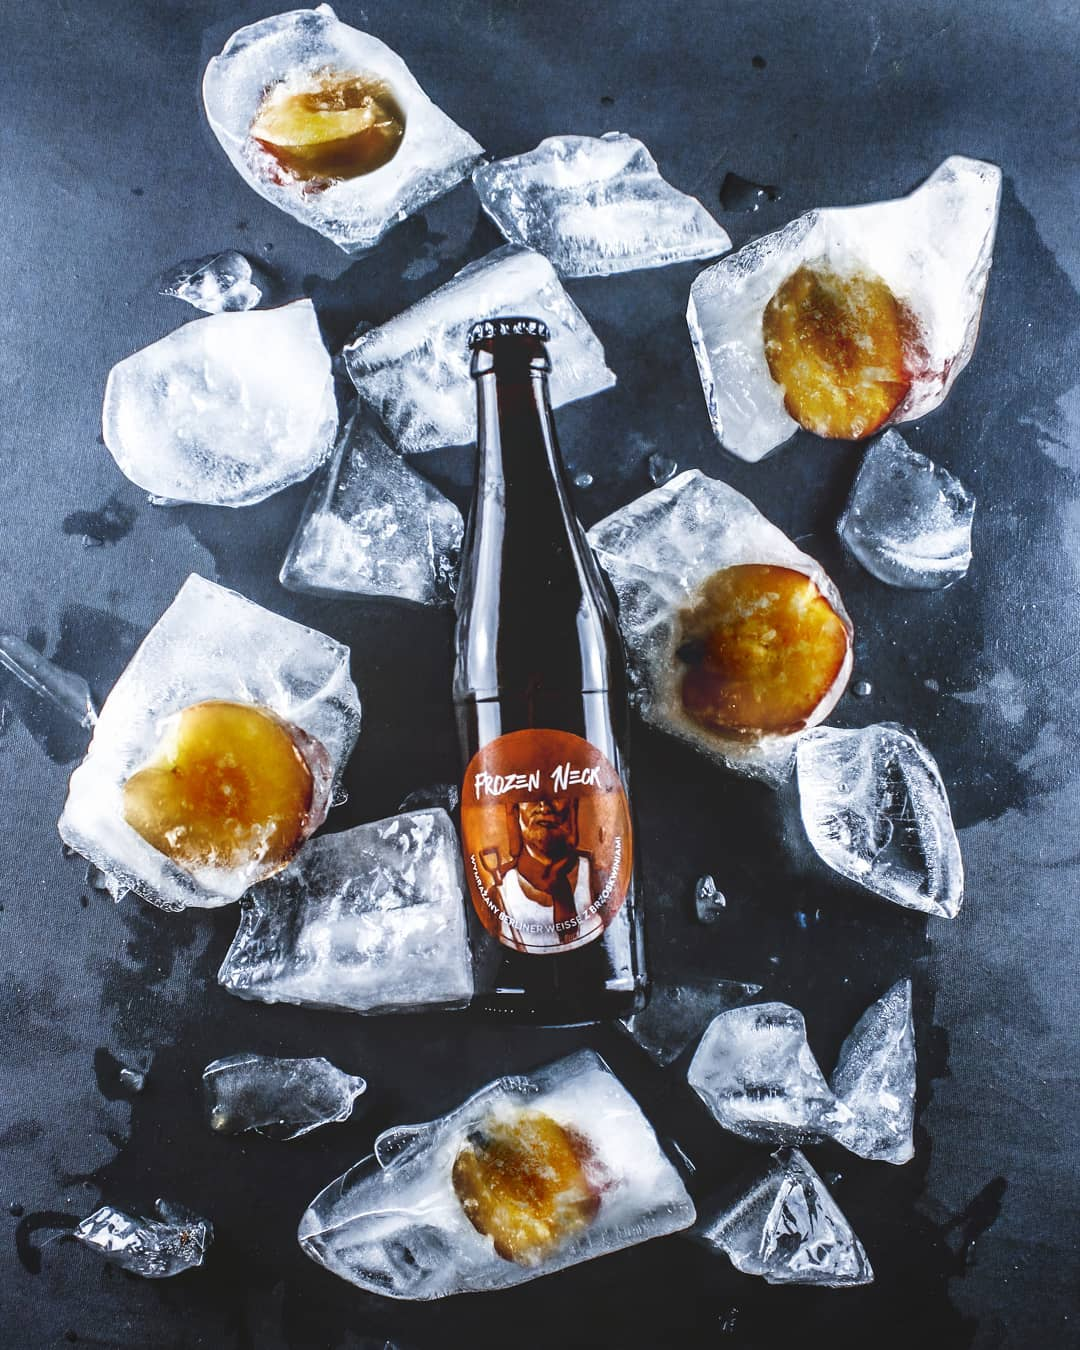 Peach Neck - The Garage Monks beer label illustration photo by Kraftowe and Jakub Cichecki